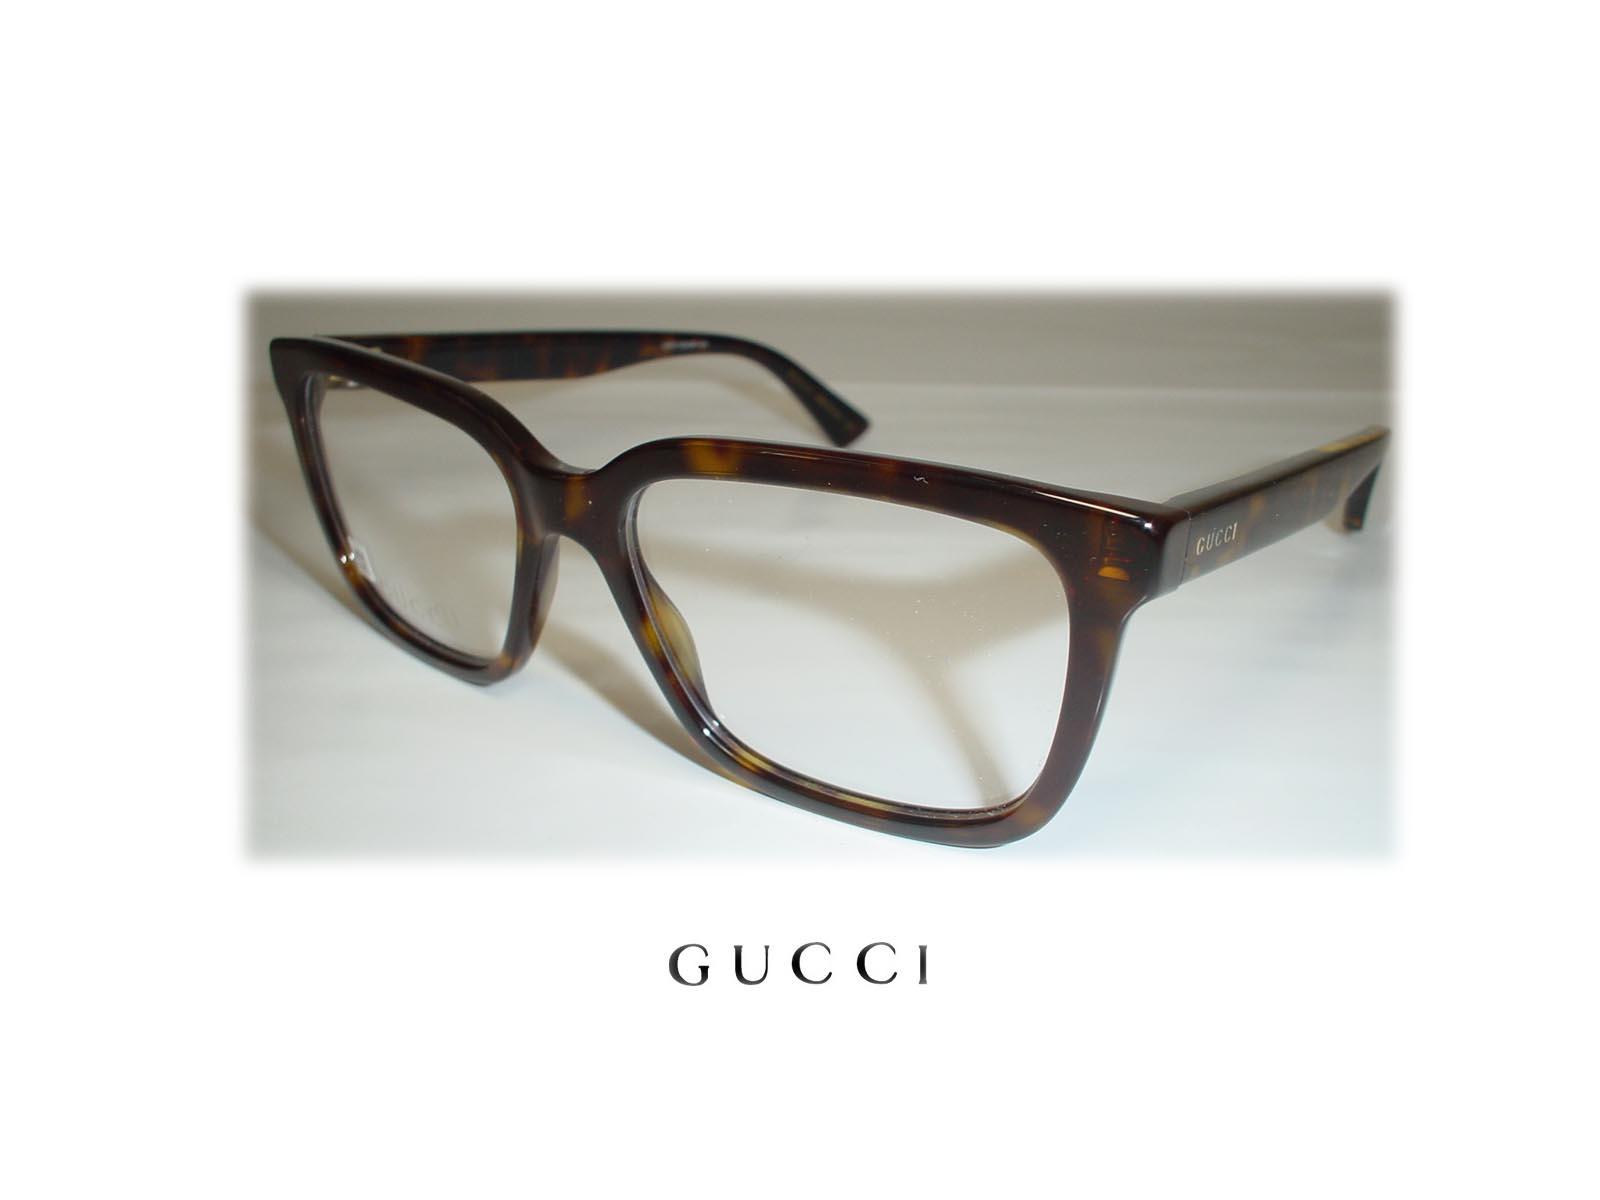 ★★GUCCI★★ GG0160O53□17-145 002ブラウン超薄型非球面レンズ付グッチ メガネ